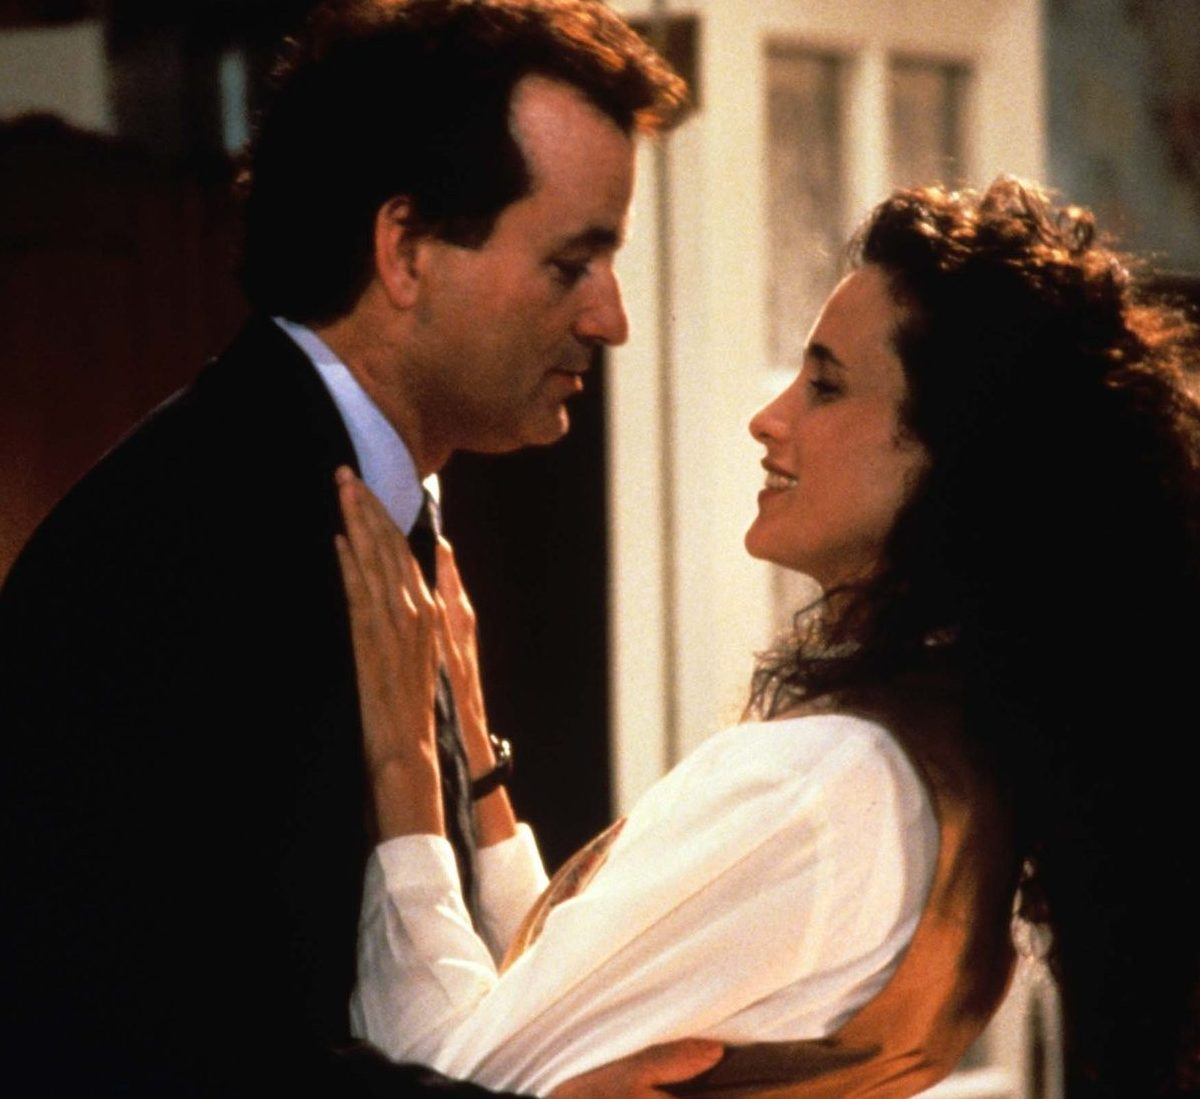 MV5BMTU1MjE5MDA4MV5BMl5BanBnXkFtZTcwMDAxMTkxNA@@. V1 e1621866121640 35 Great Movie Romances That Are Actually Deeply Problematic